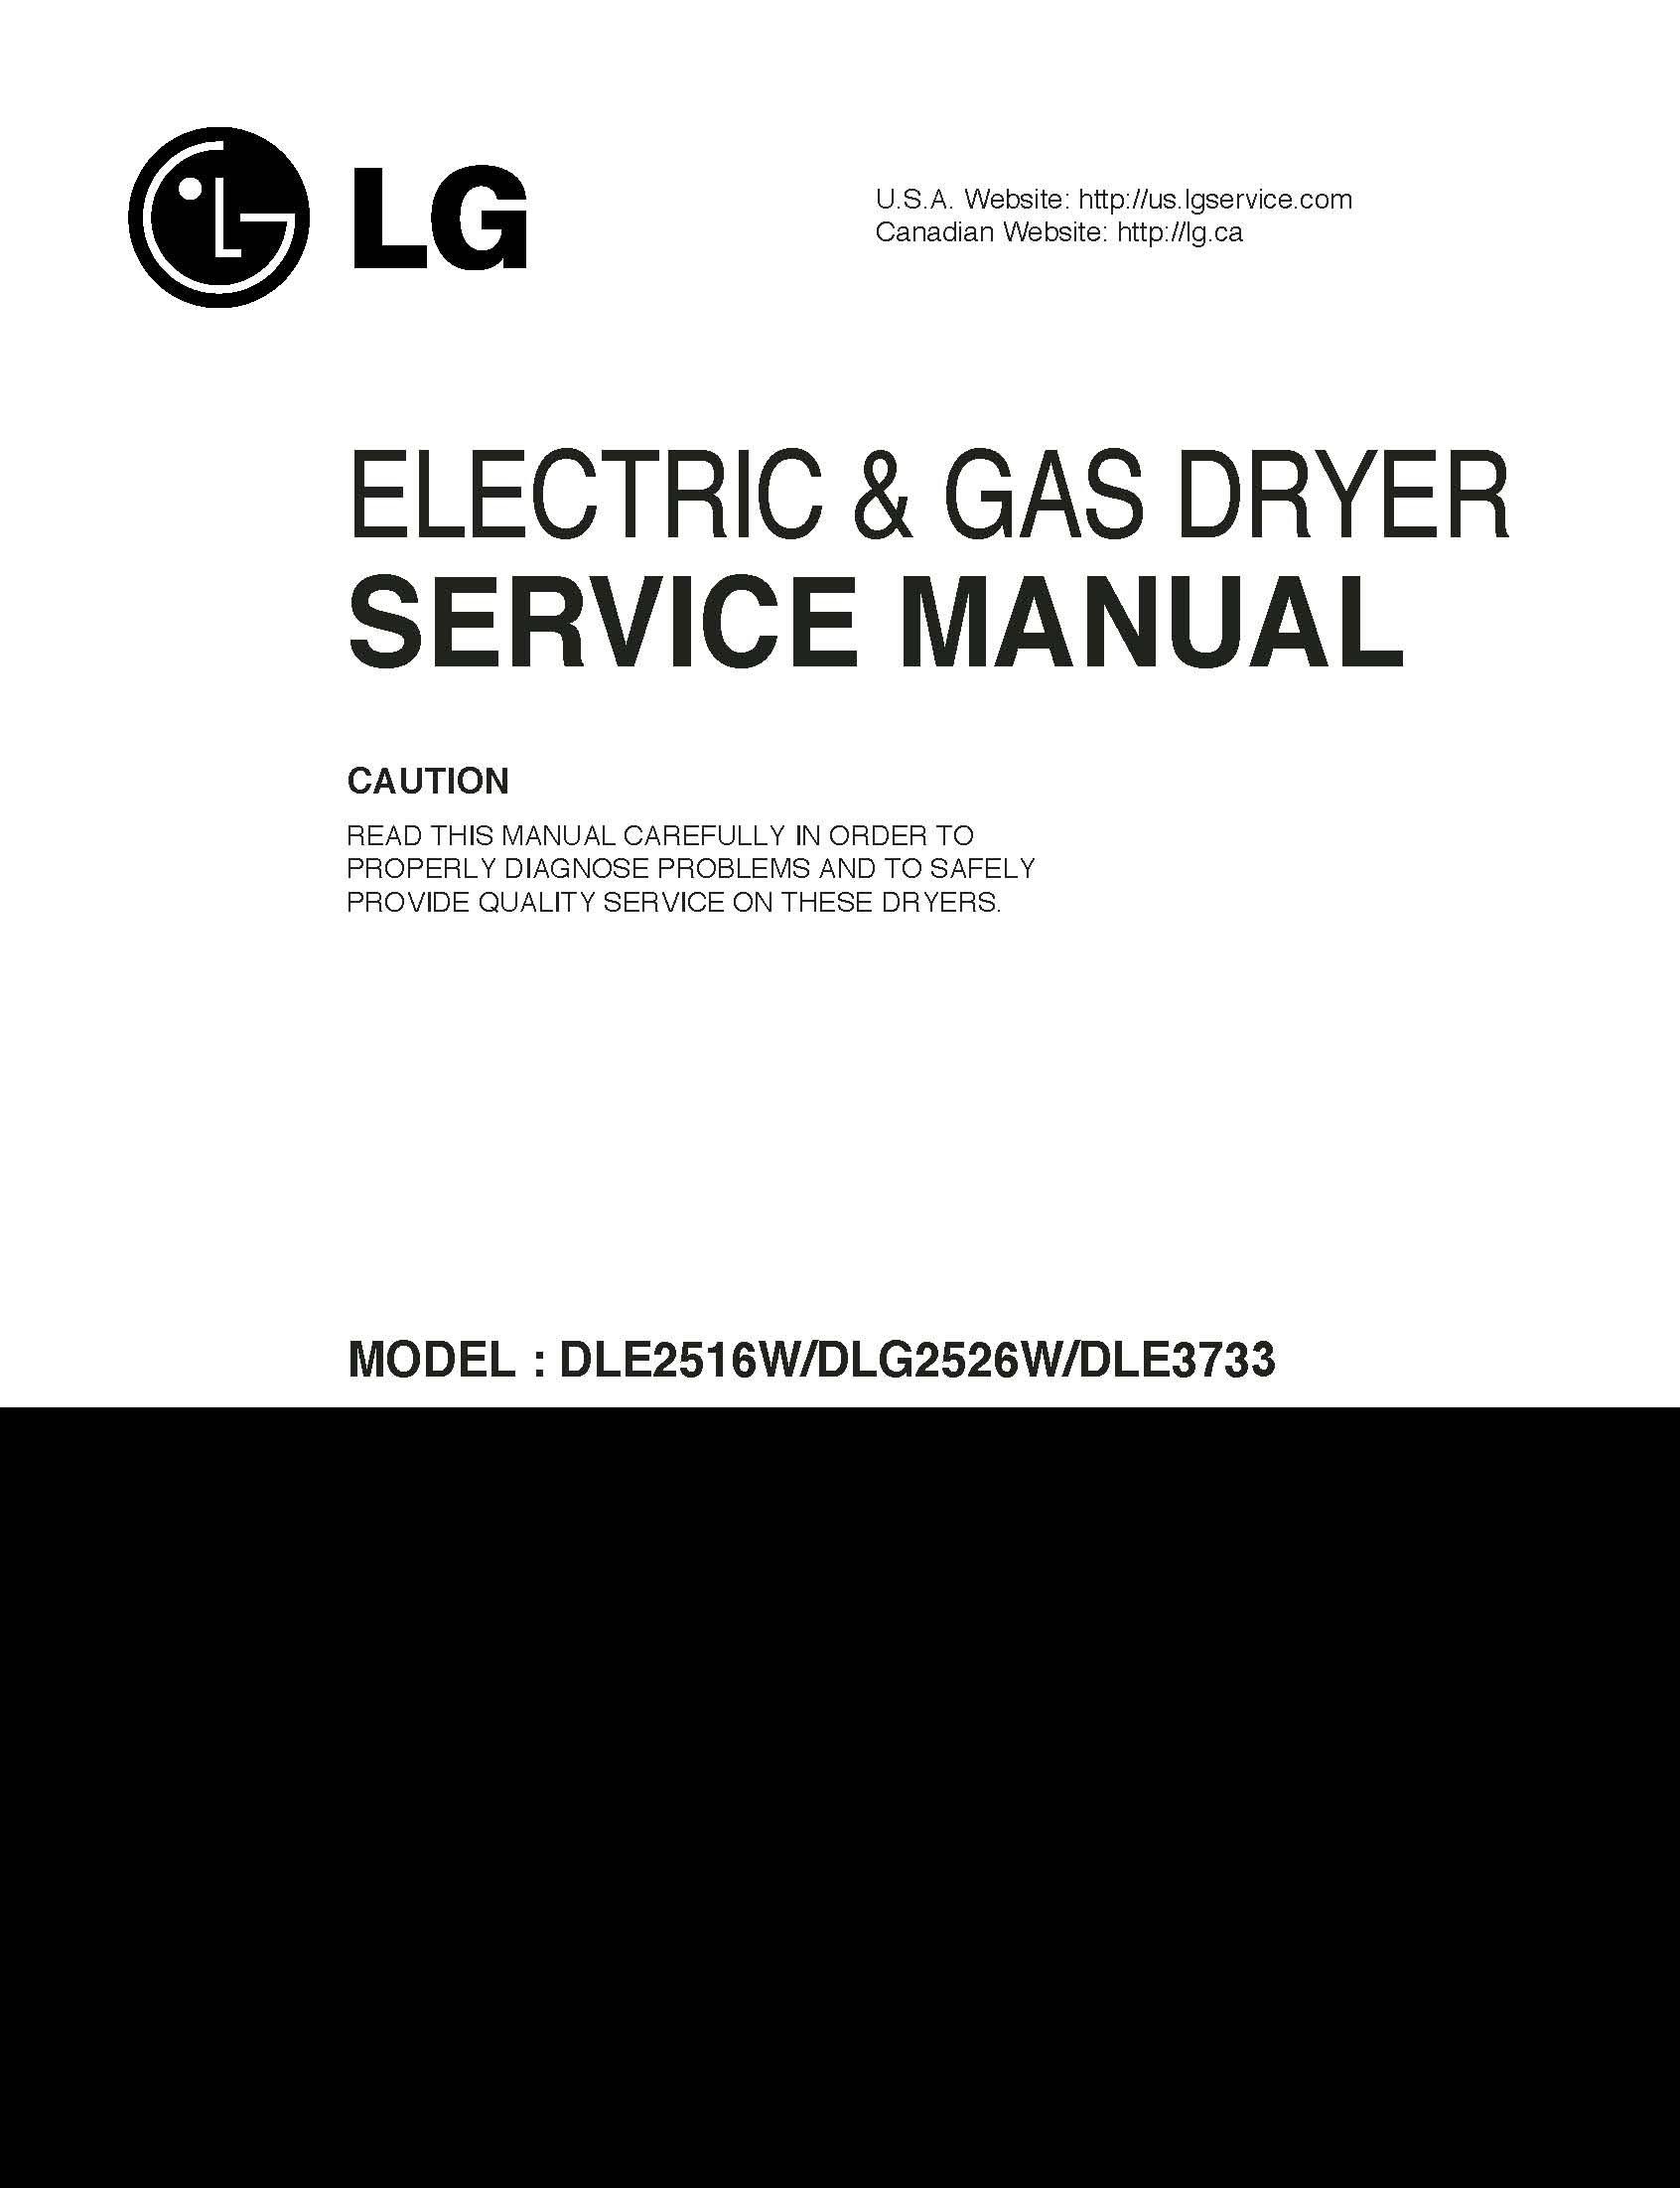 dle2516w service manual online user manual u2022 rh pandadigital co LG DLE2516W Dryer Lint Filter LG DLE2516W Parts